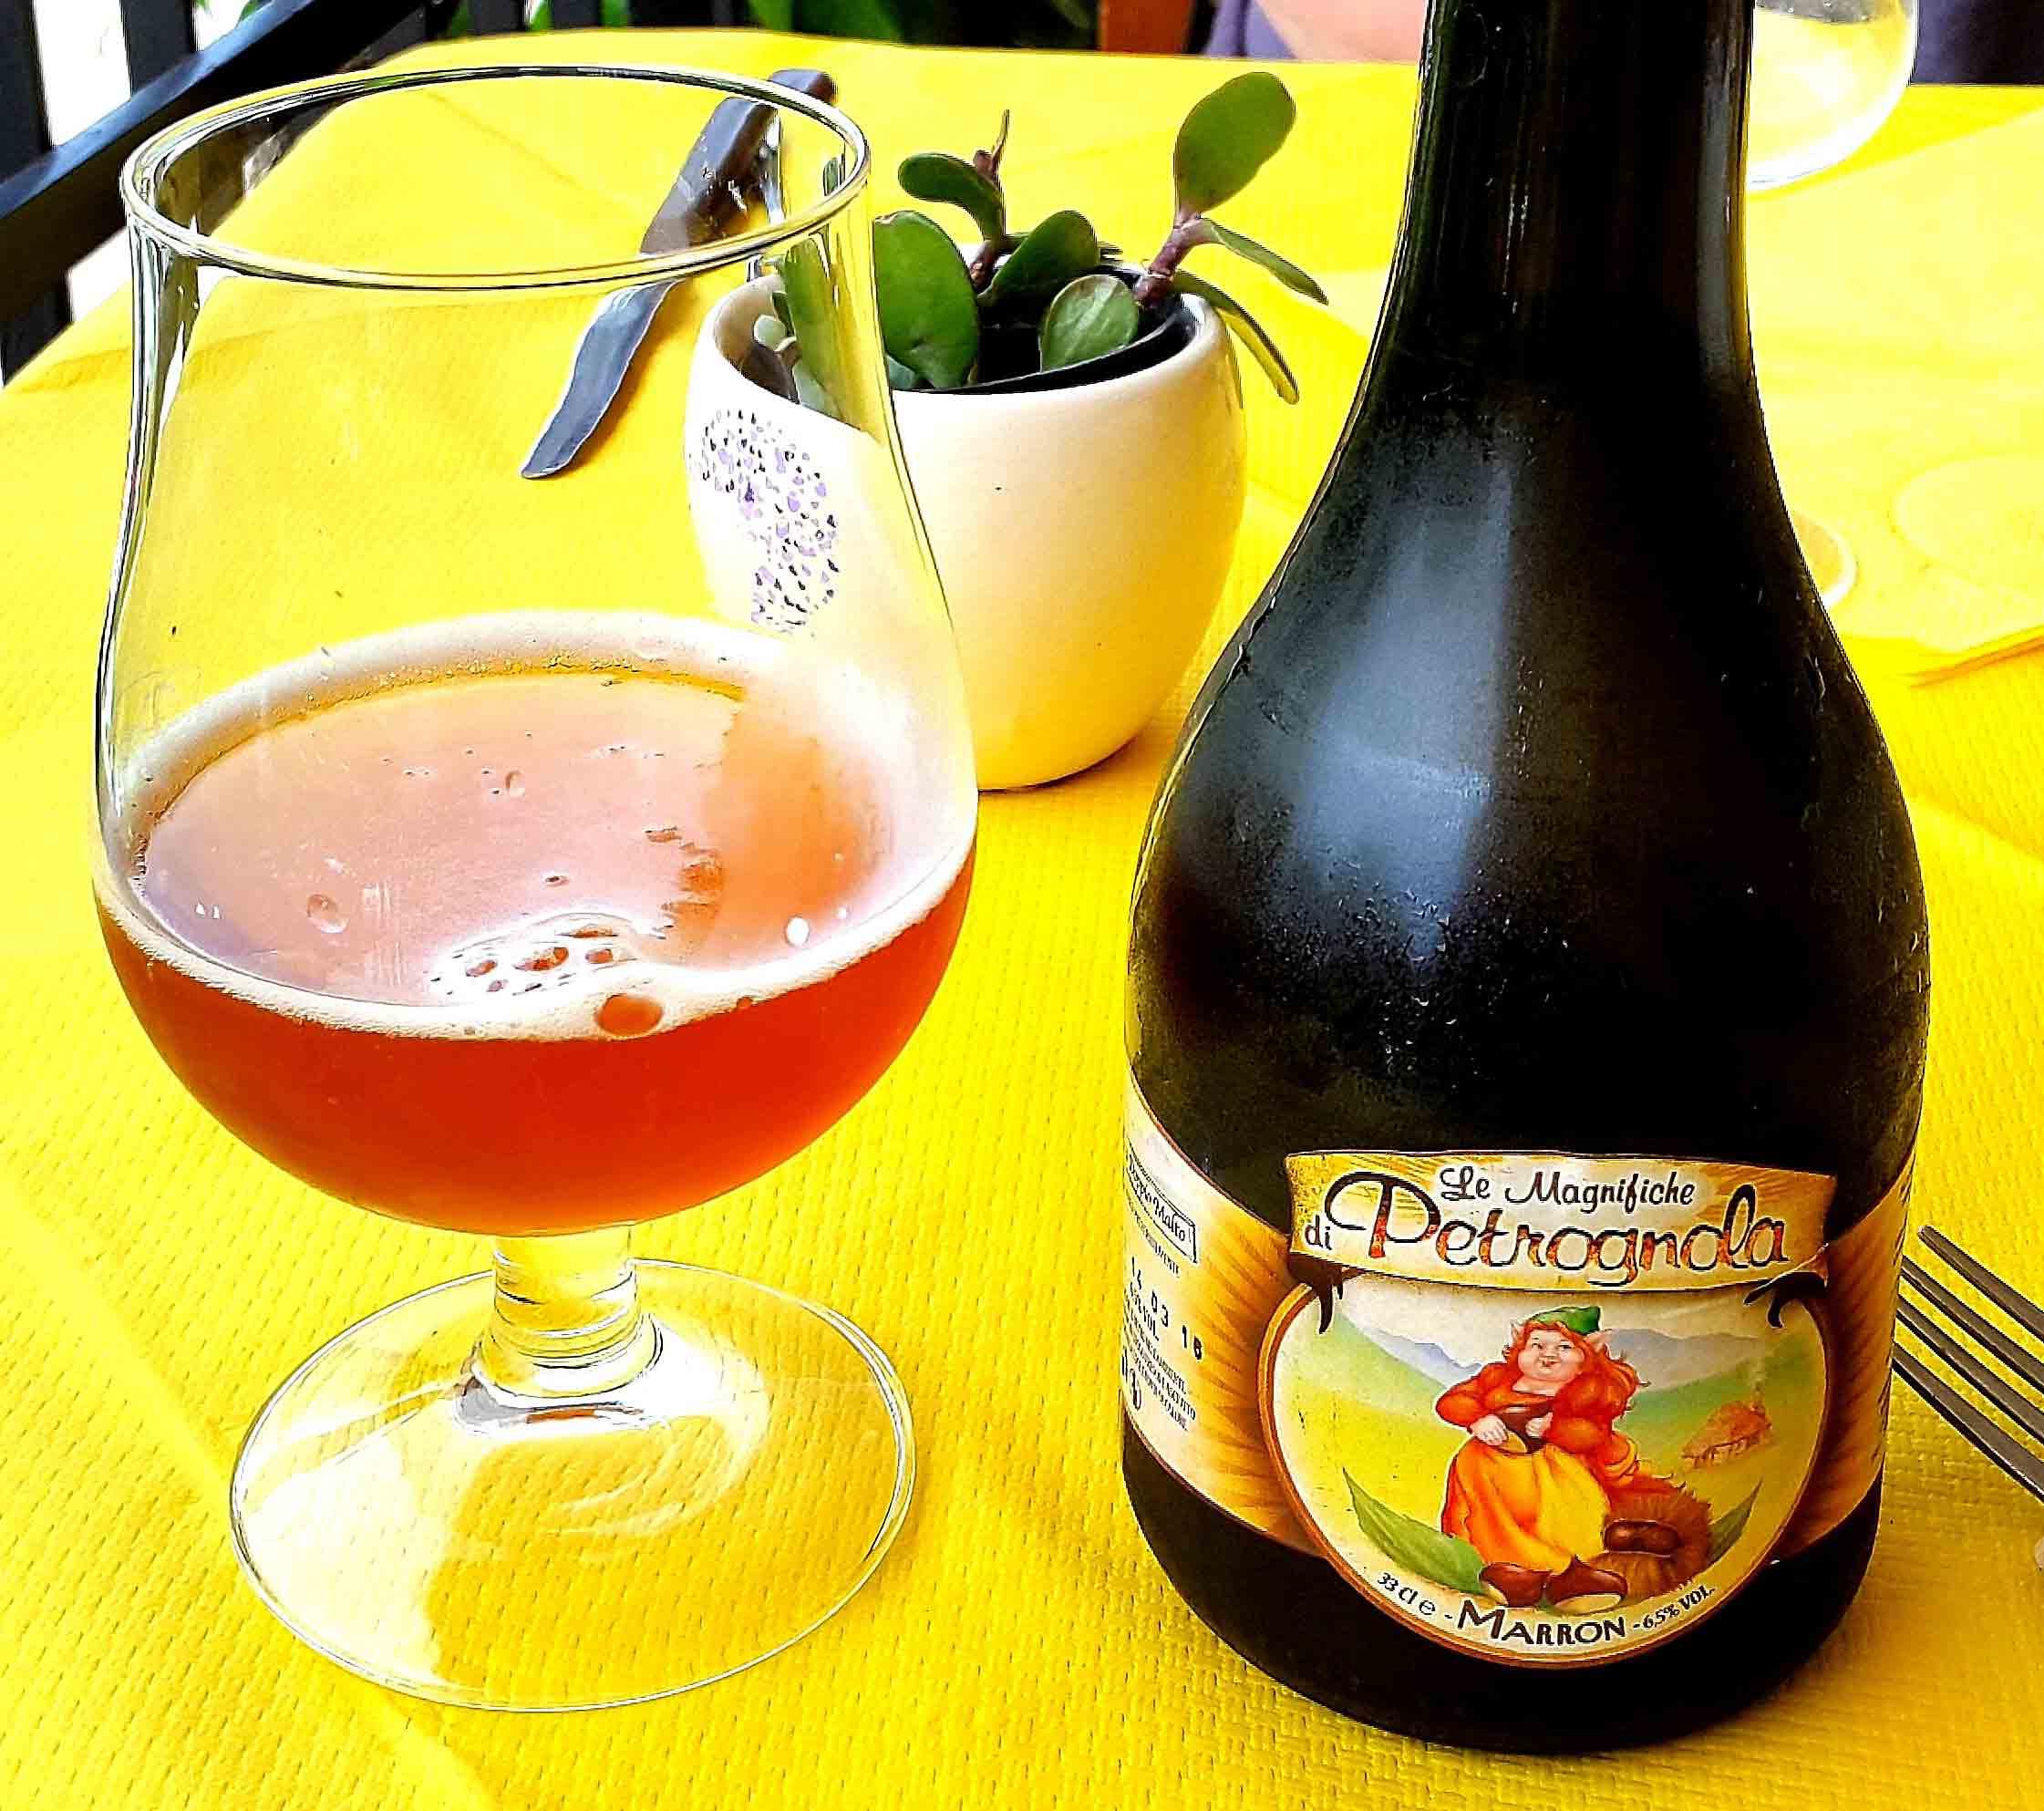 øl fra Garfagnana